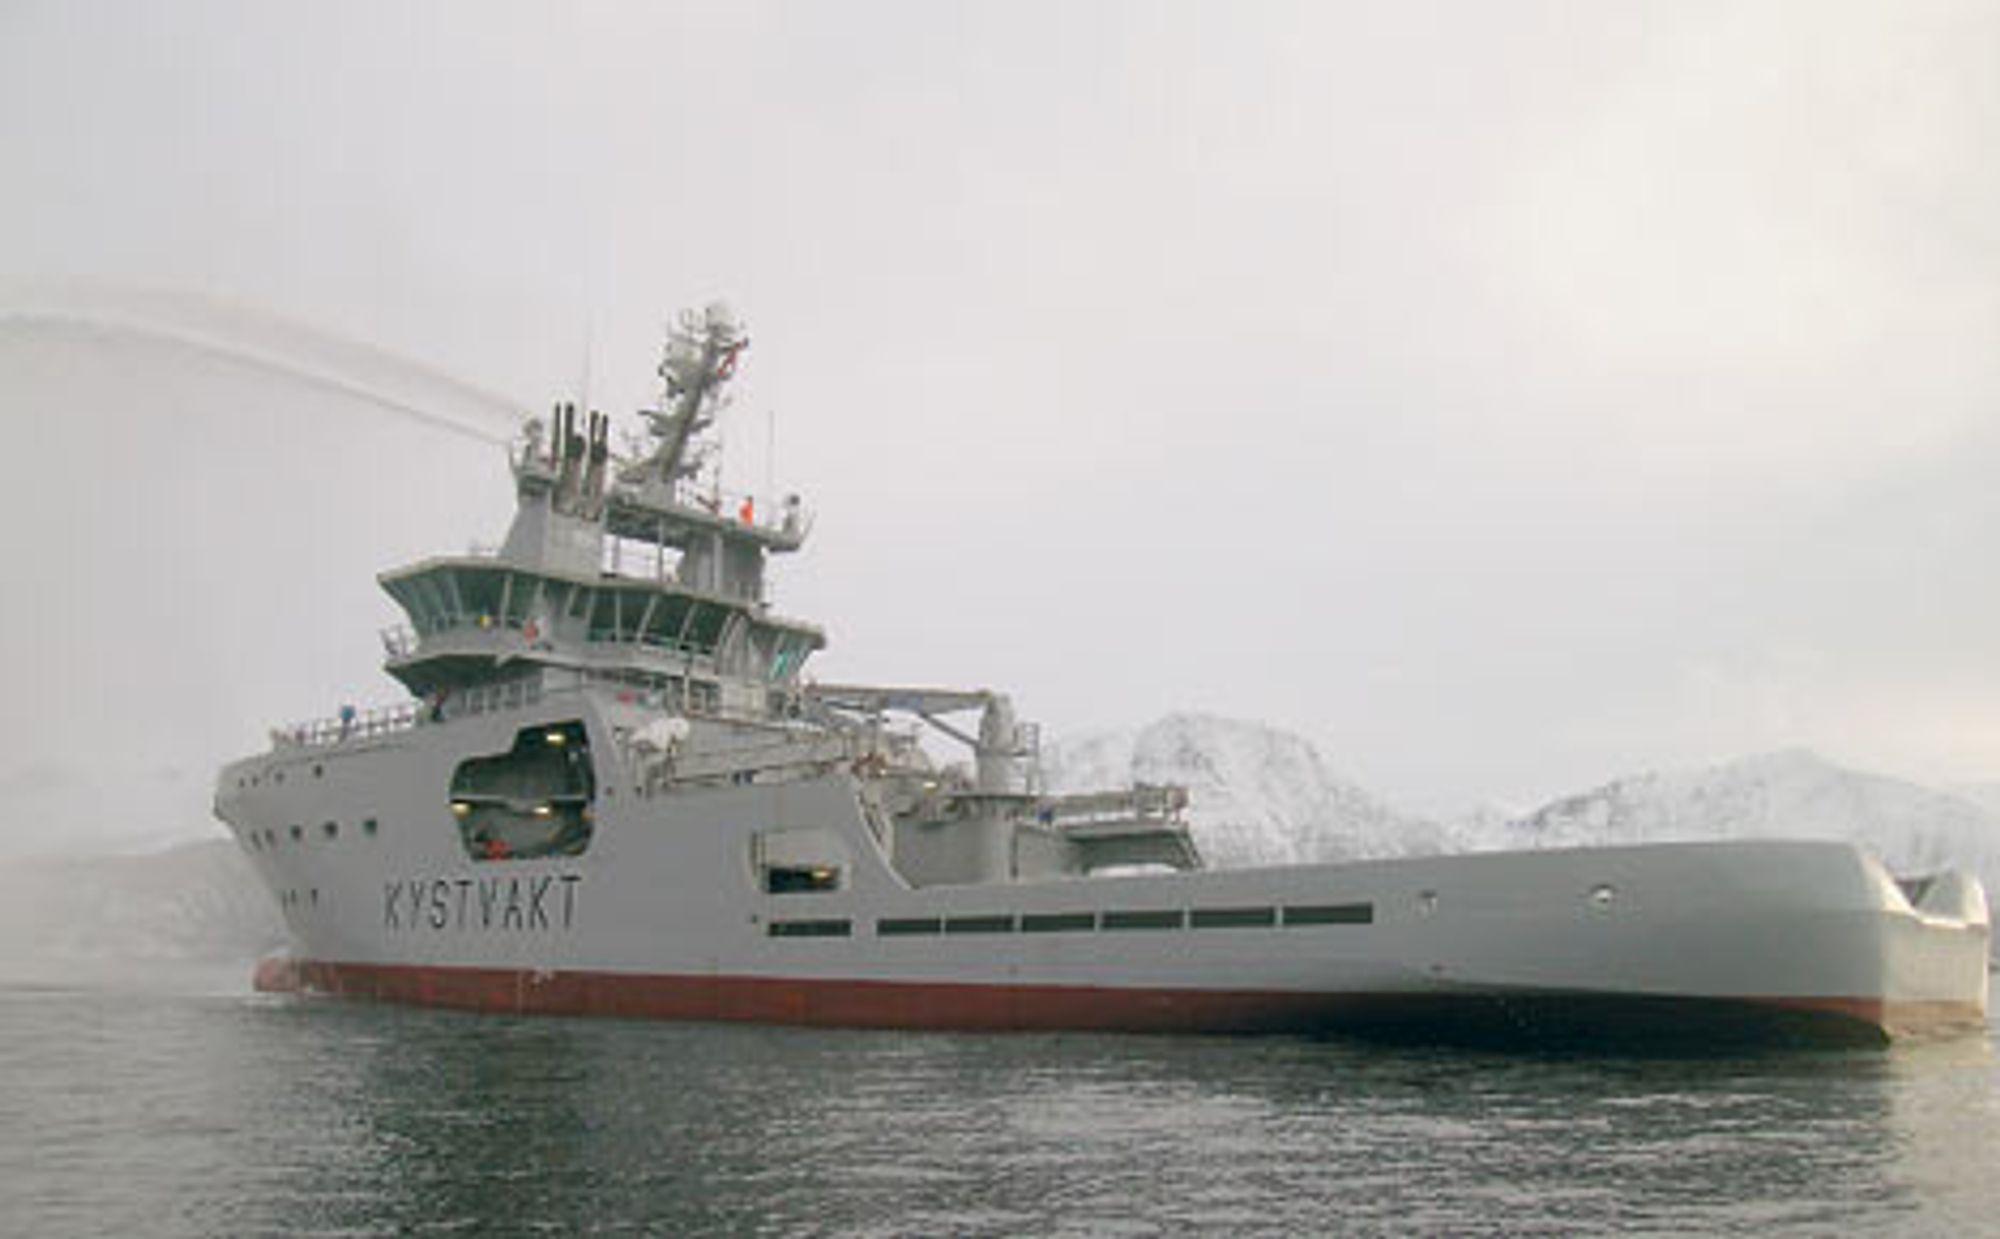 HELNORSK: Både design og all utrustning om bord er norsk. I midten av februar settes skipet i operativ tjeneste. FOTO: AKER YARDS